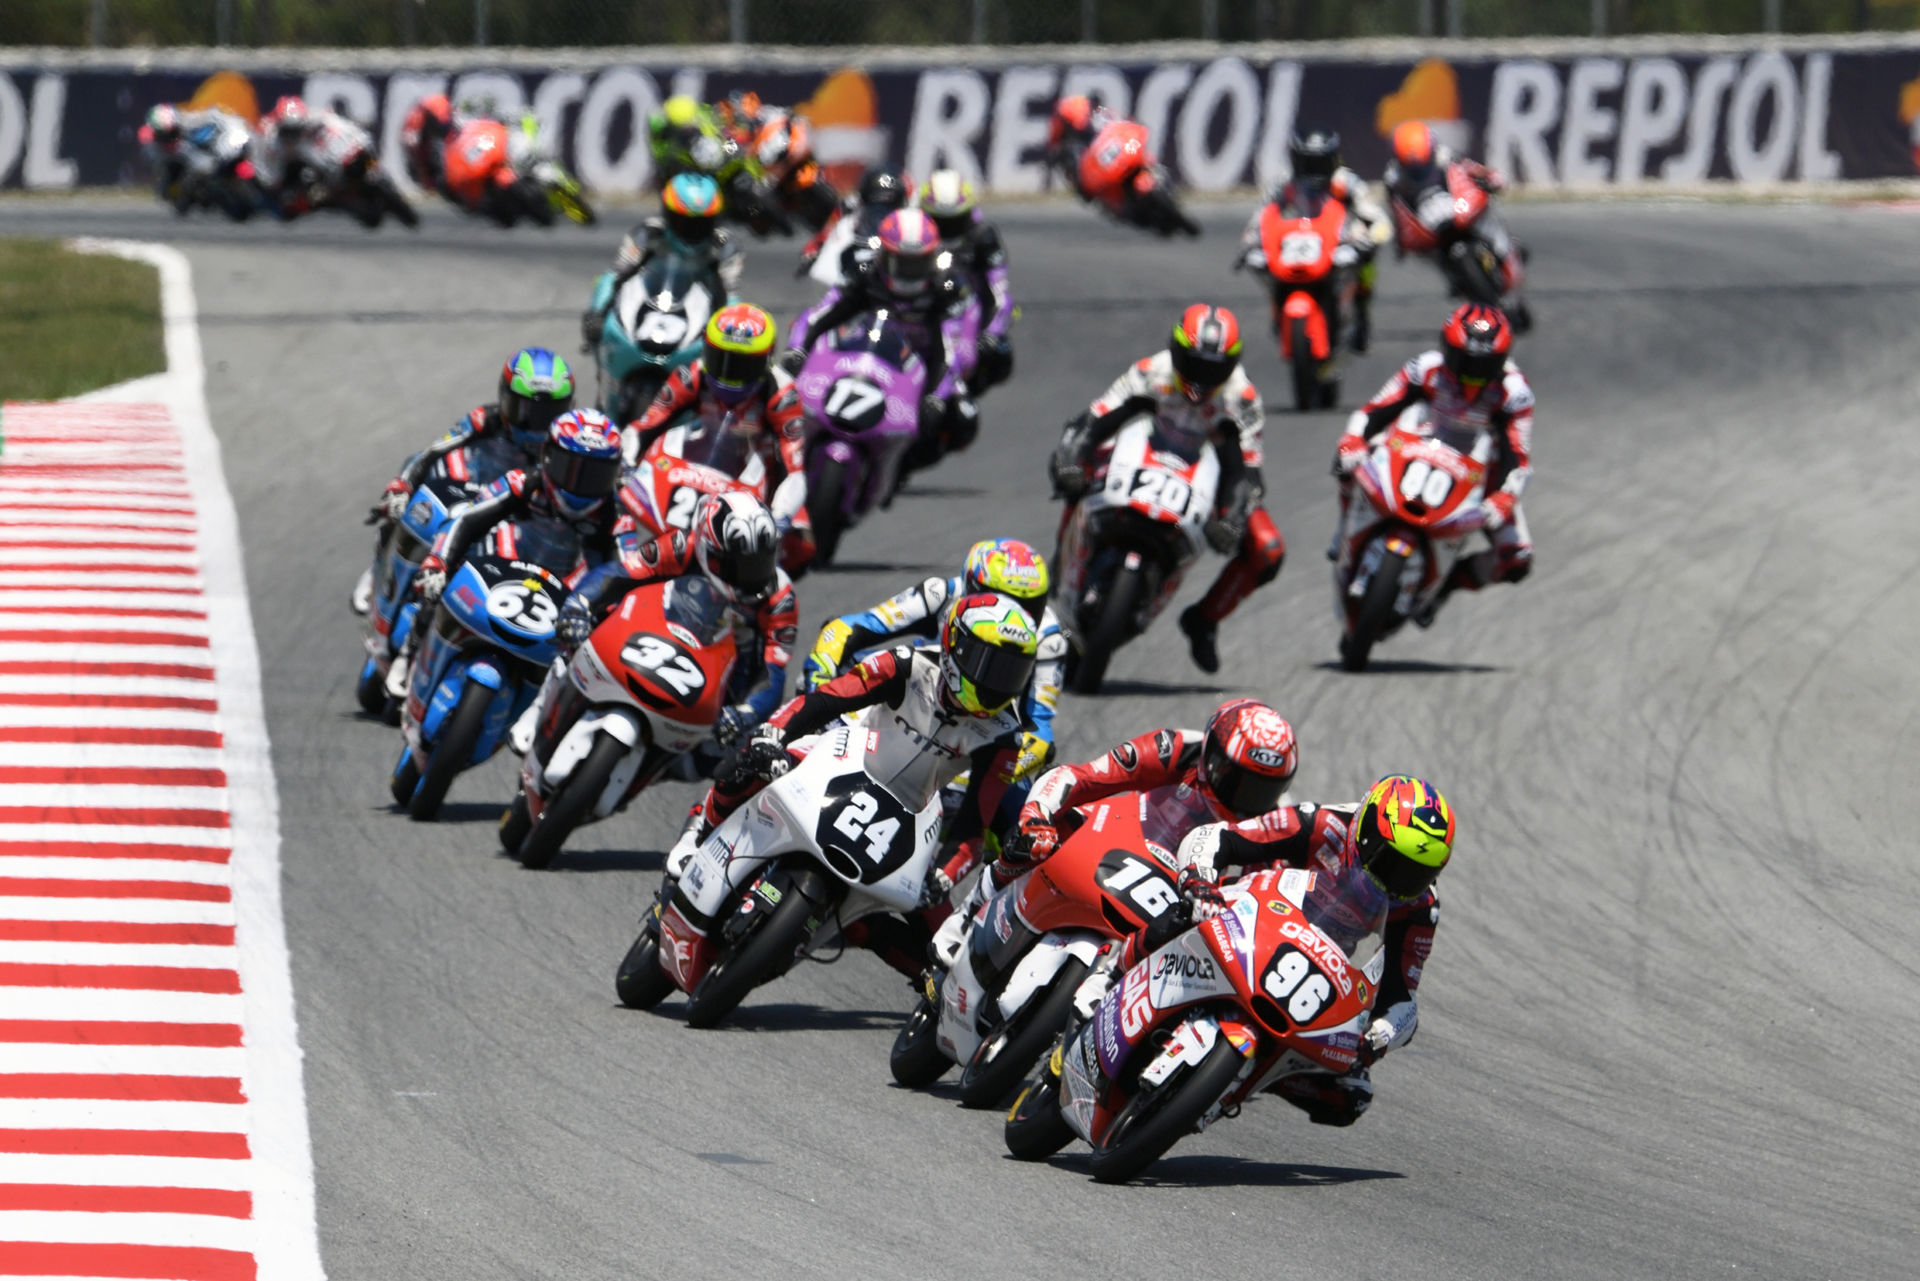 Daniel Holgado (96) leads the start of Moto3 Race Two at Catalunya. Courtesy FIM CEV Repsol Press Office.